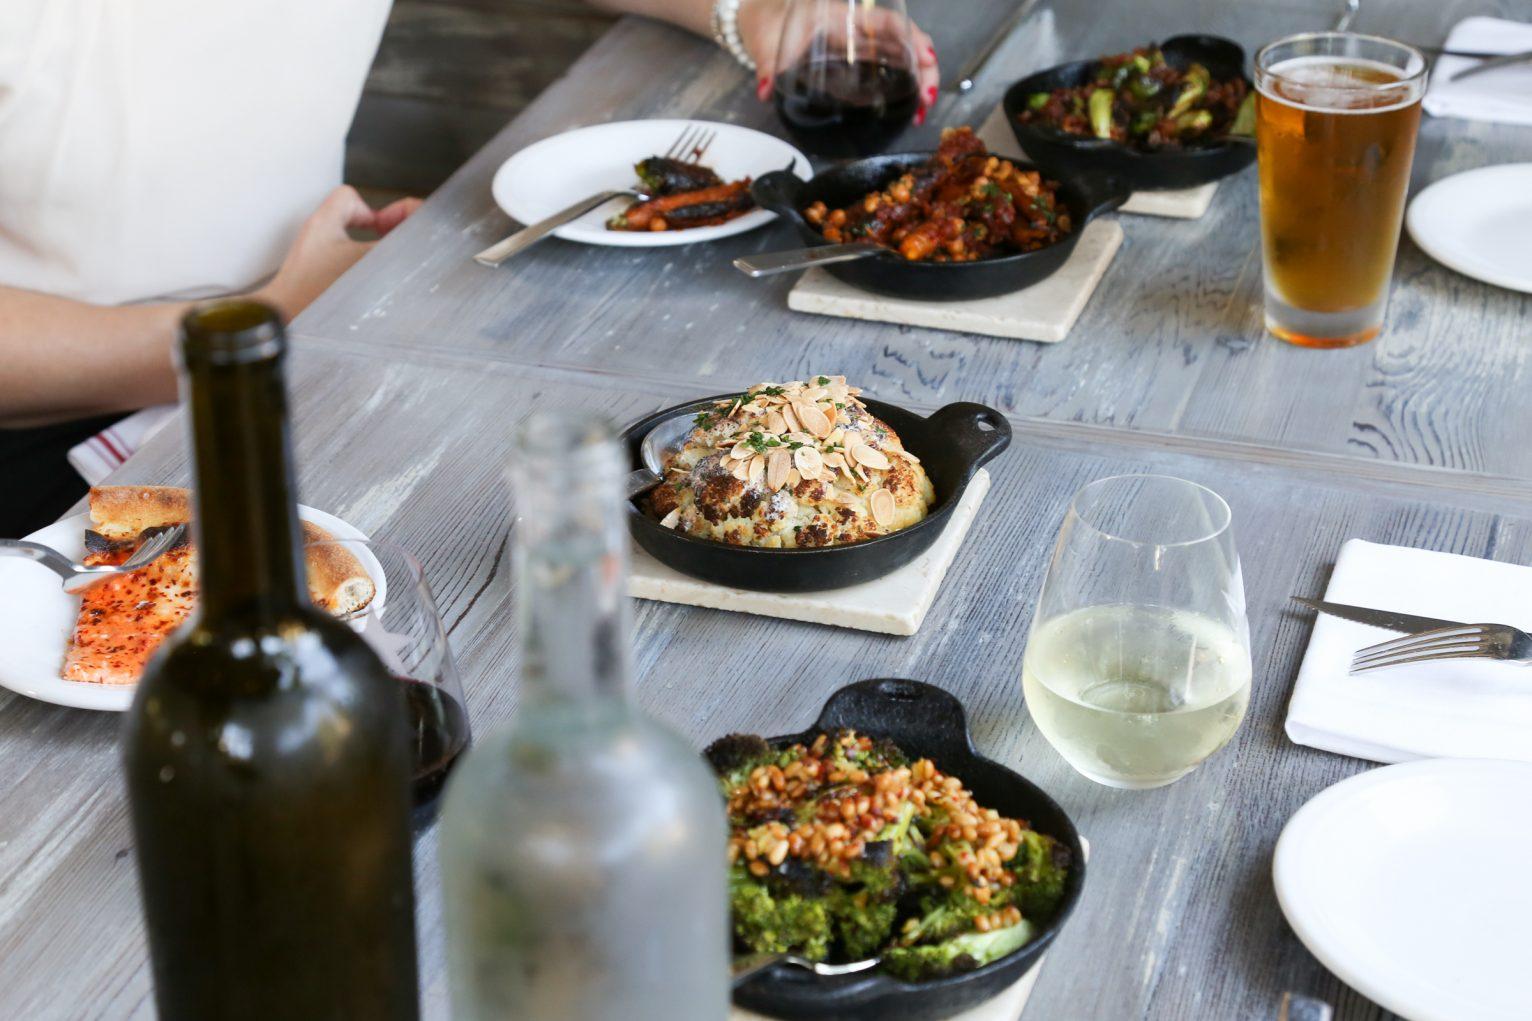 Dinners enjoying locally-sourced food